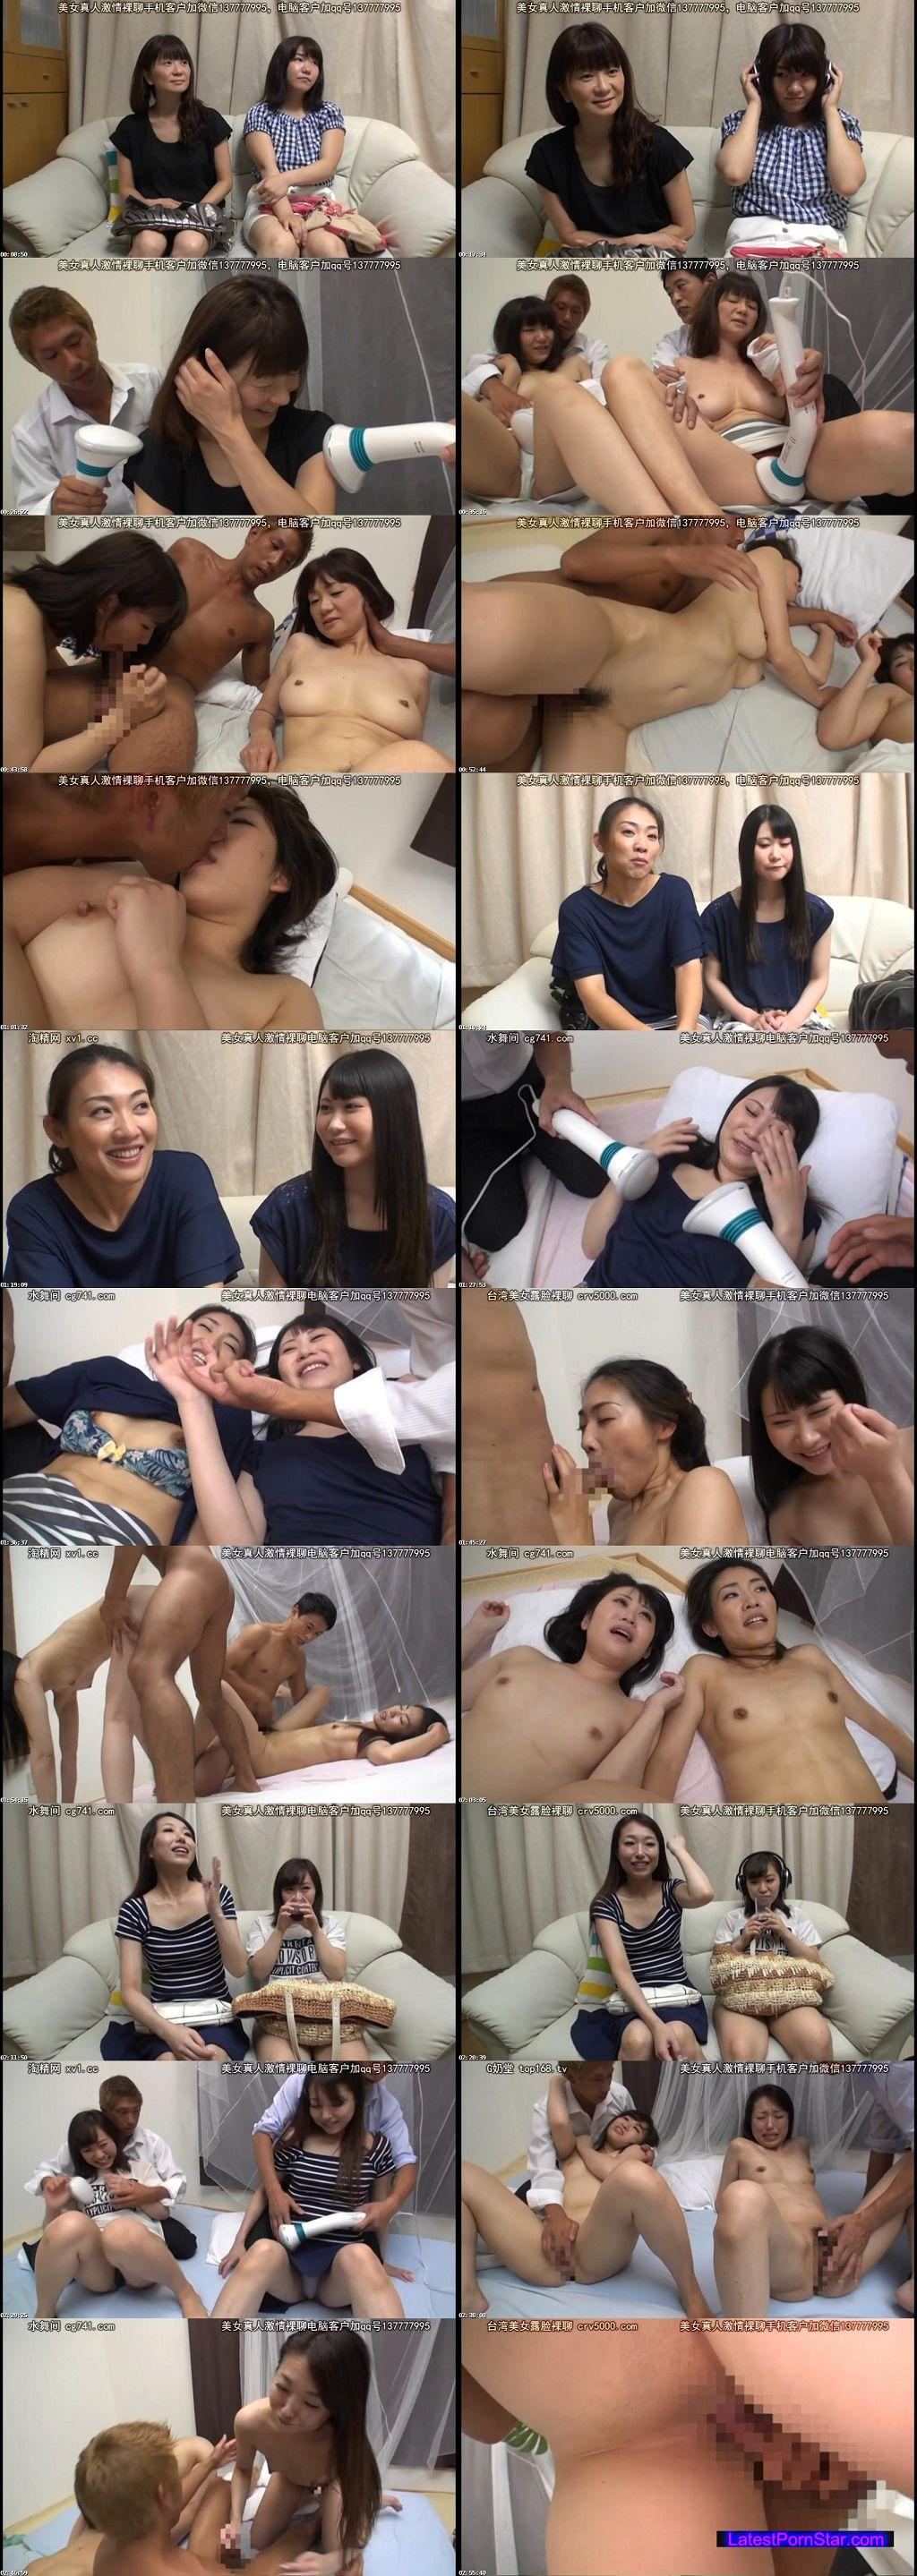 [RDVHJ-075] 素人!!母娘ナンパ中出し!!Vol 5